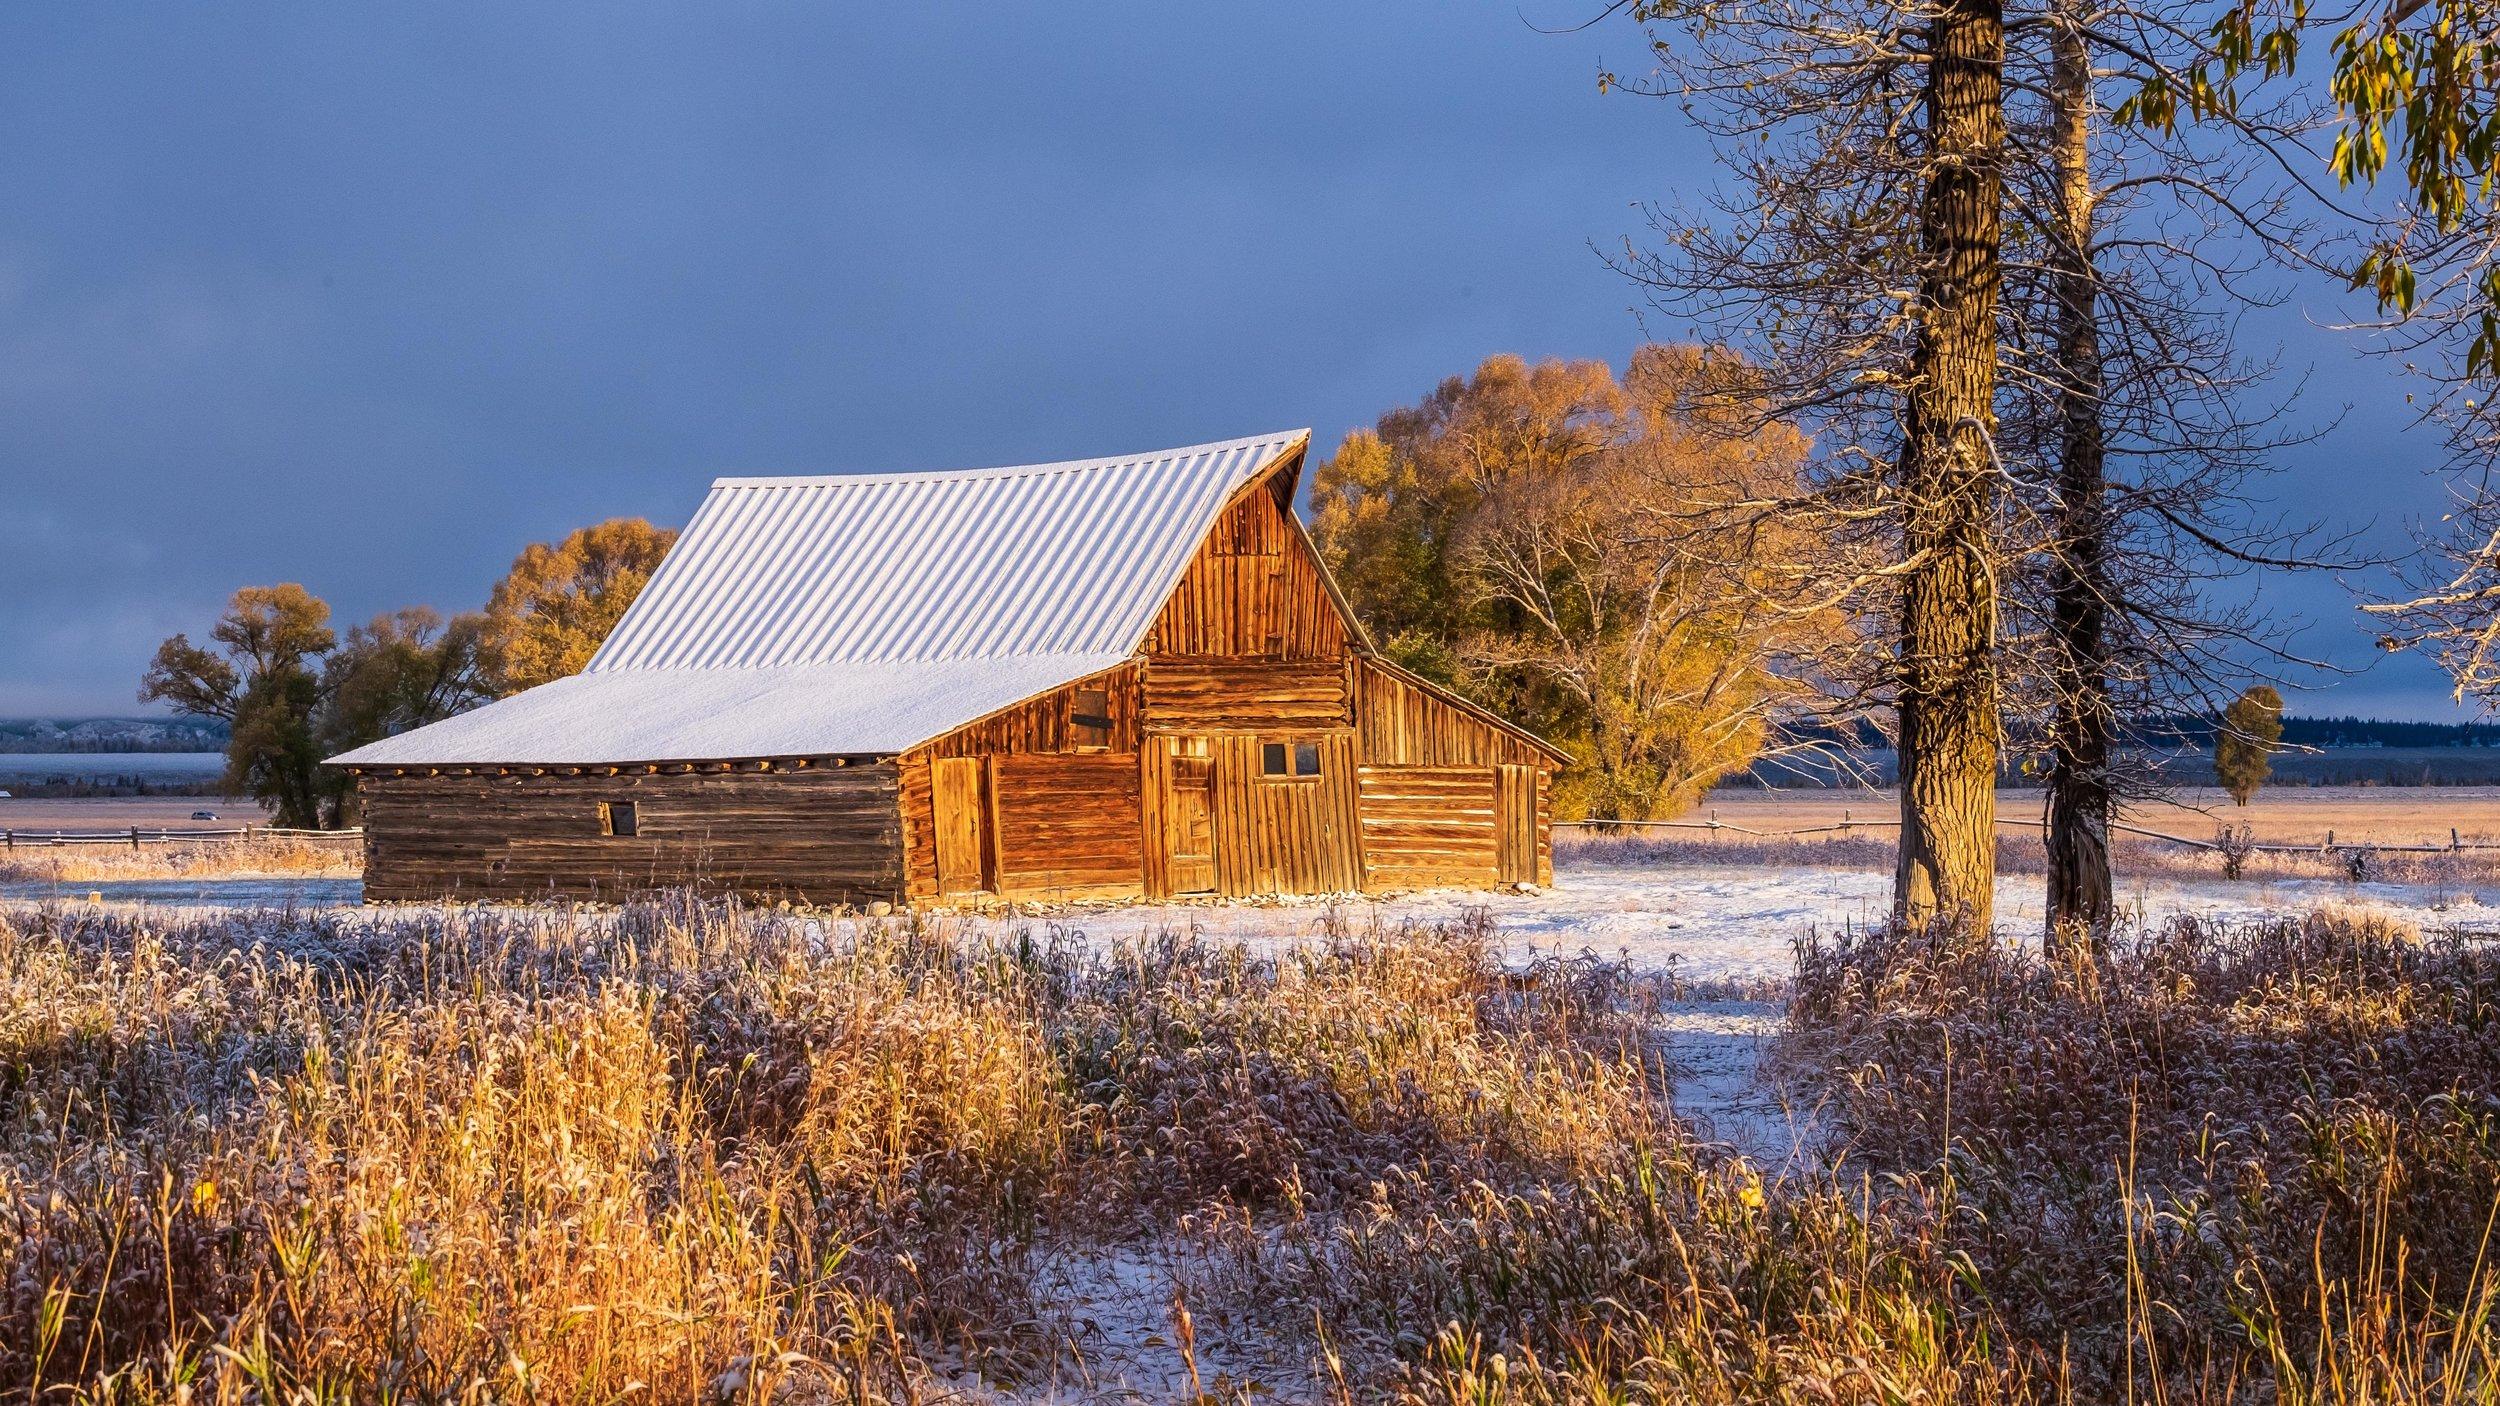 Moulton barn landscape grand teton national park.jpg